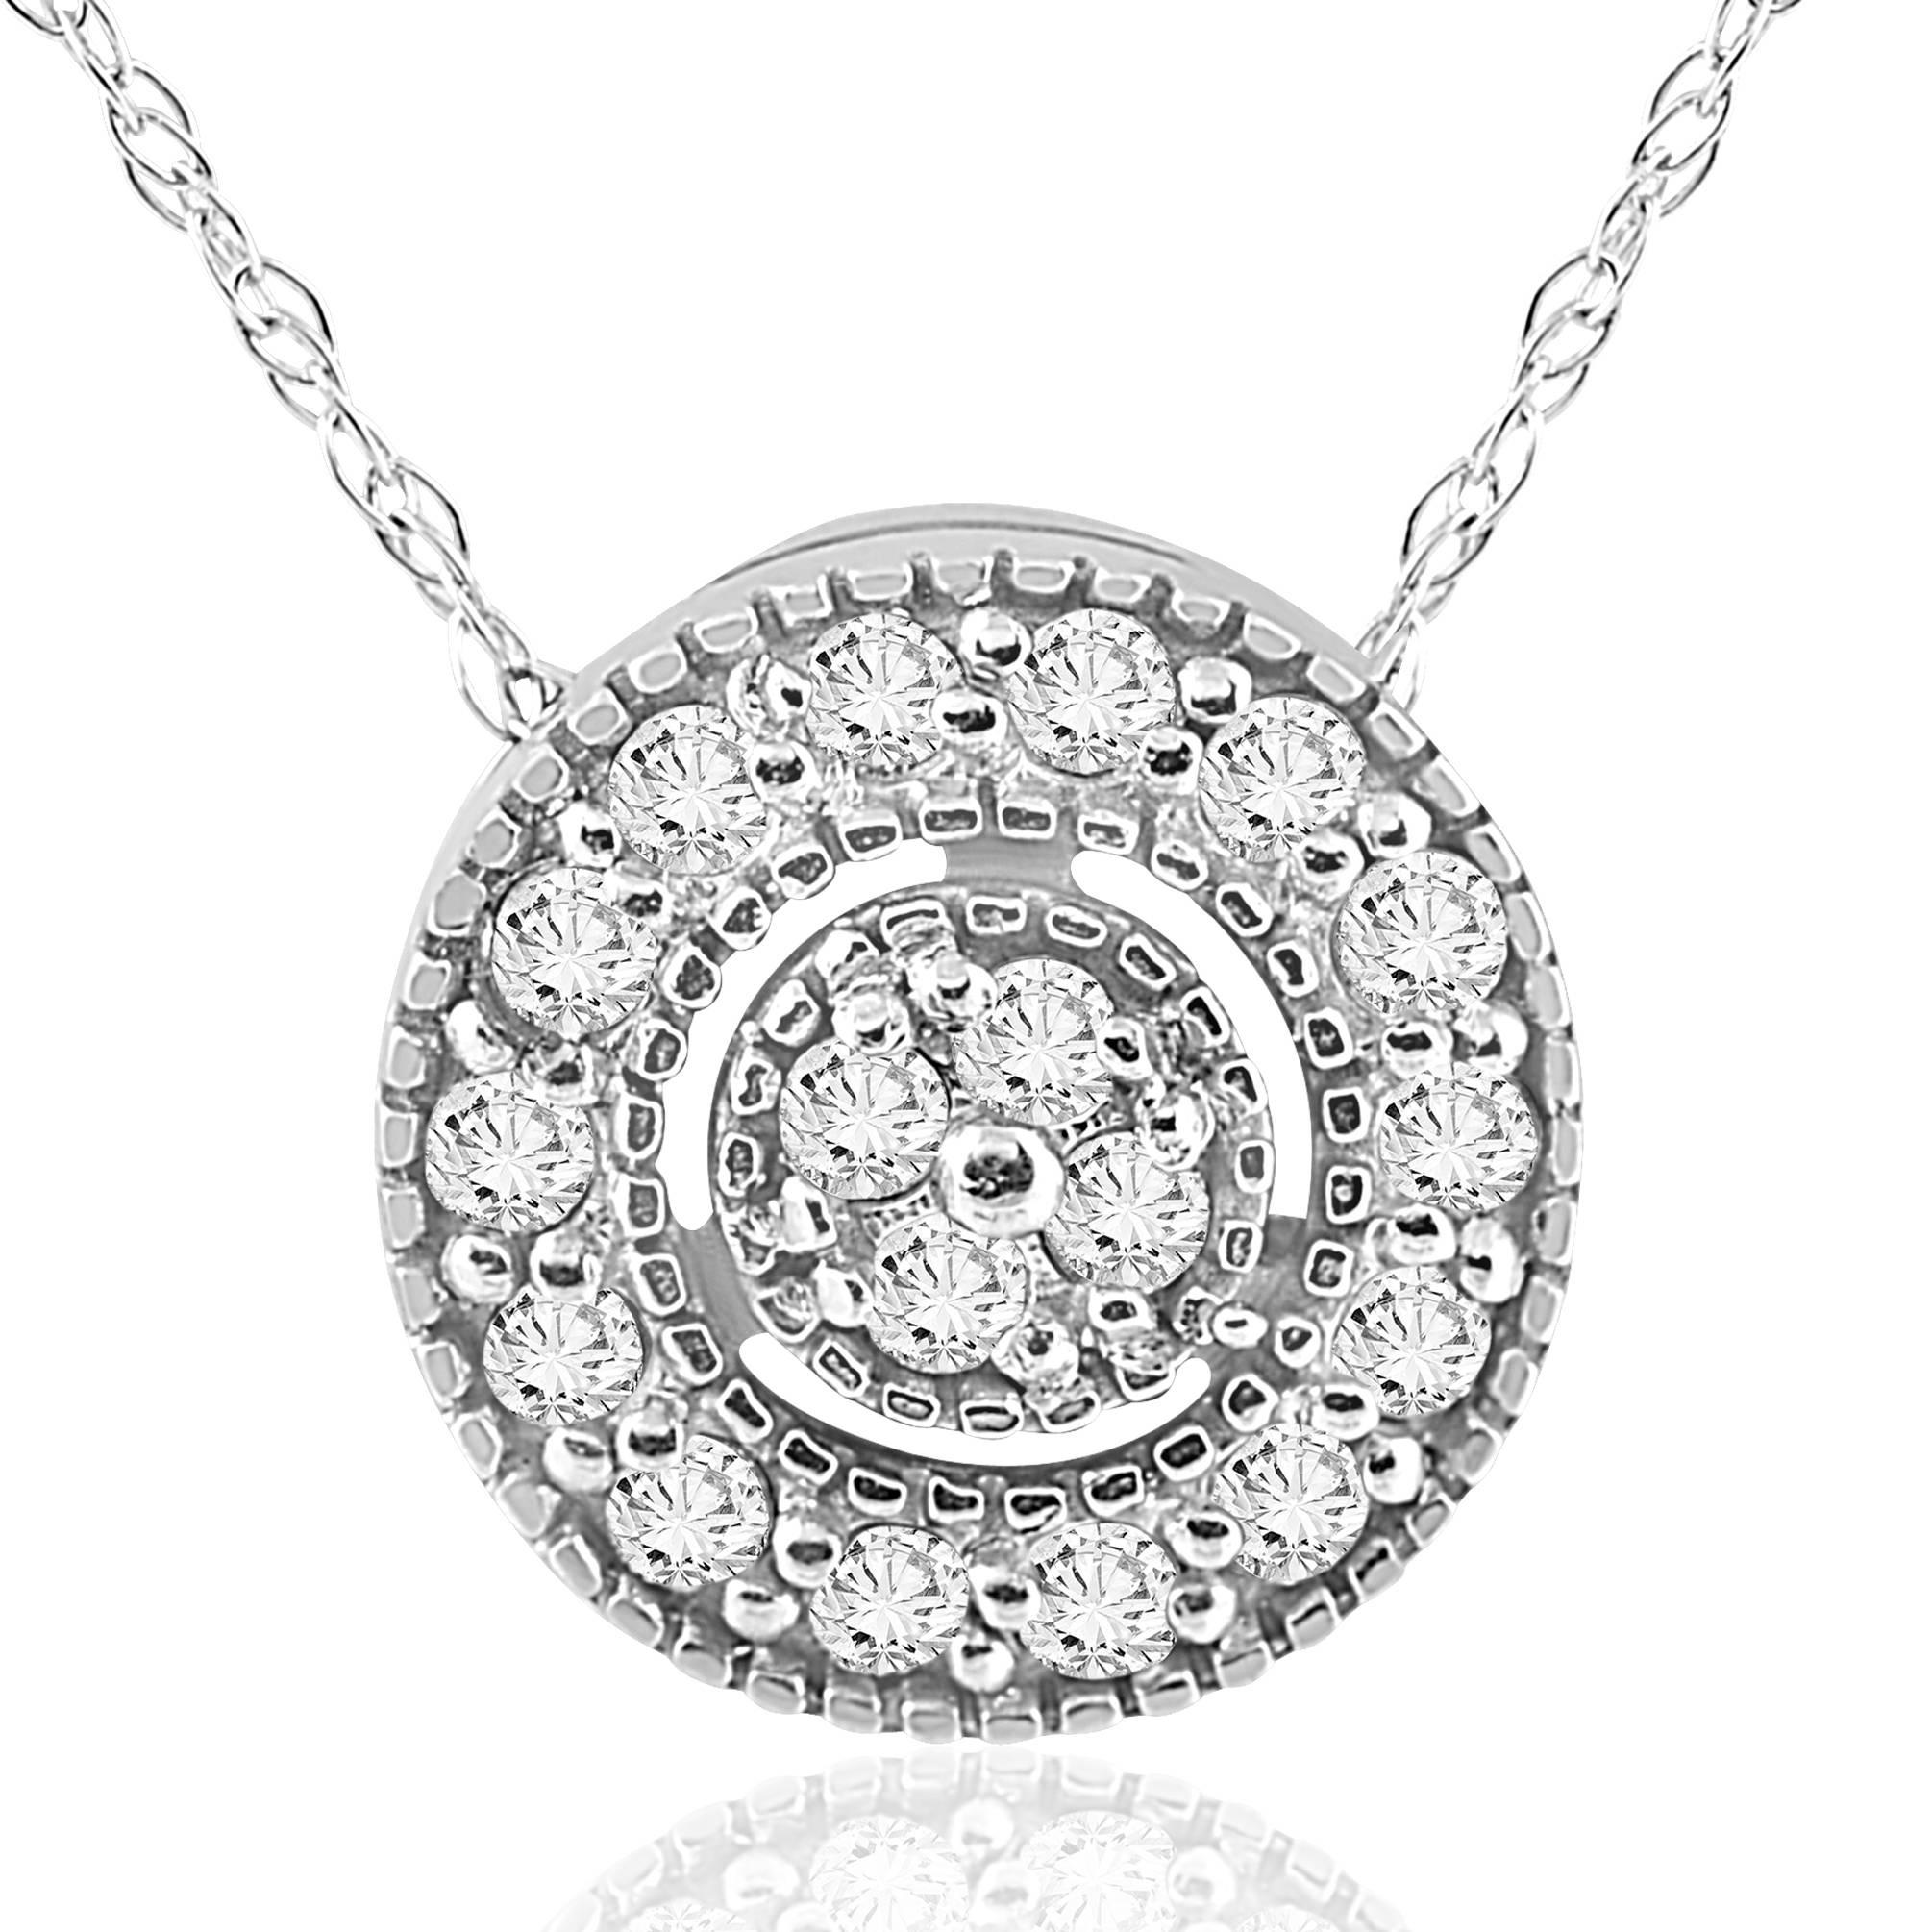 1 4 ct Diamond Pave Halo Pendant 14K White Gold Womens Necklace